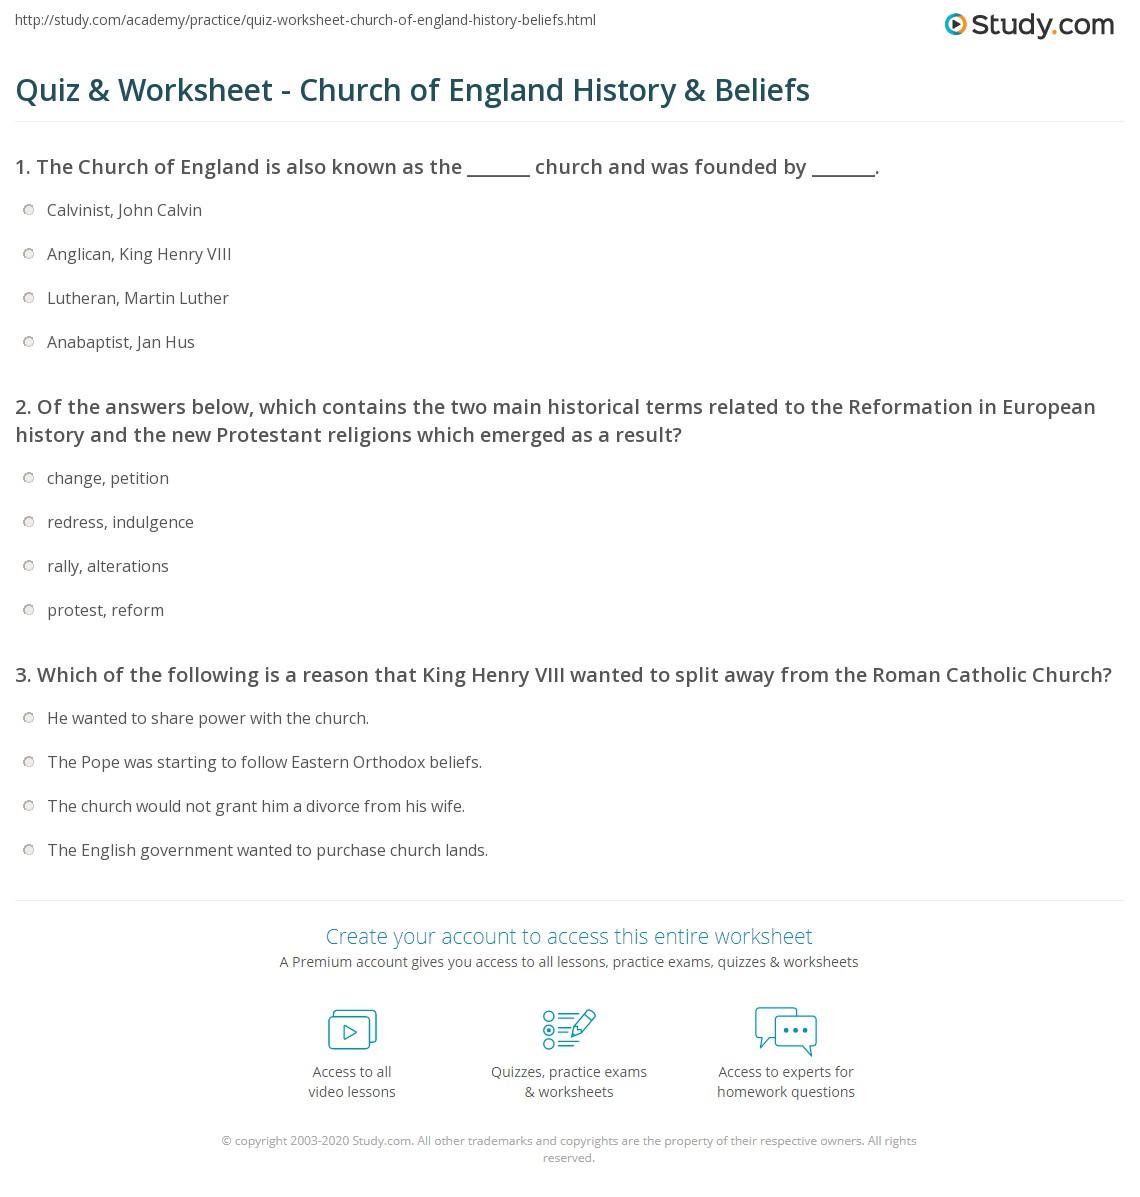 Print Church of England: History & Beliefs Worksheet